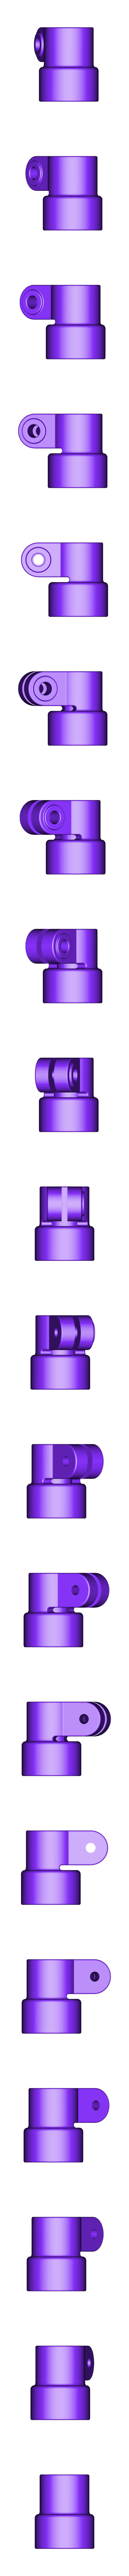 Pipe__D0_A1lamp.STL Download free STL file Tripod GIANT width Masked SLA 3D Printing Technology • 3D print model, perinski